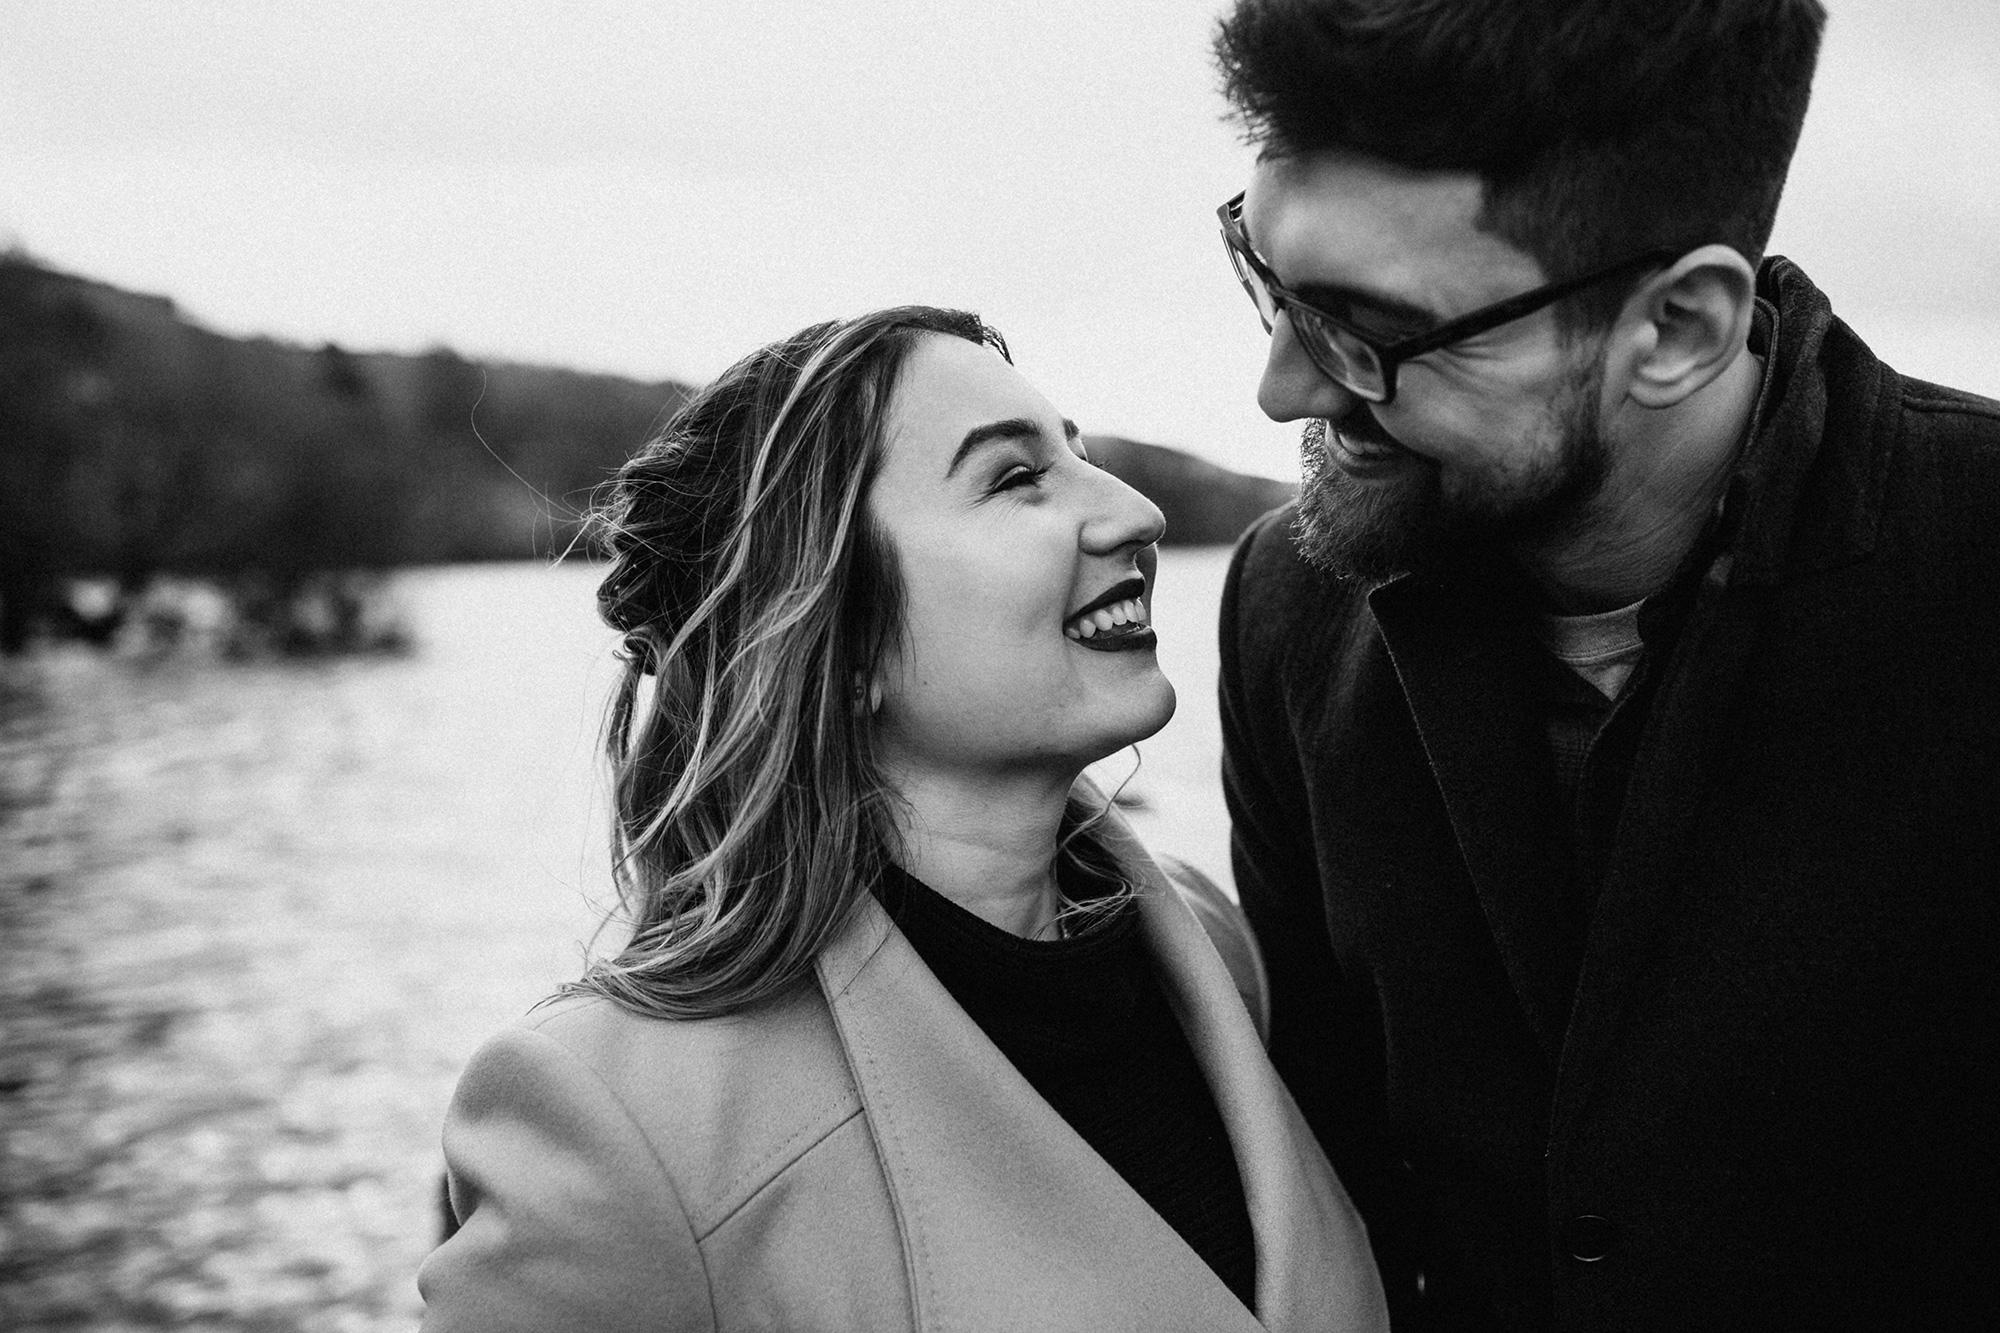 lakeland-couple-shoot.jpg